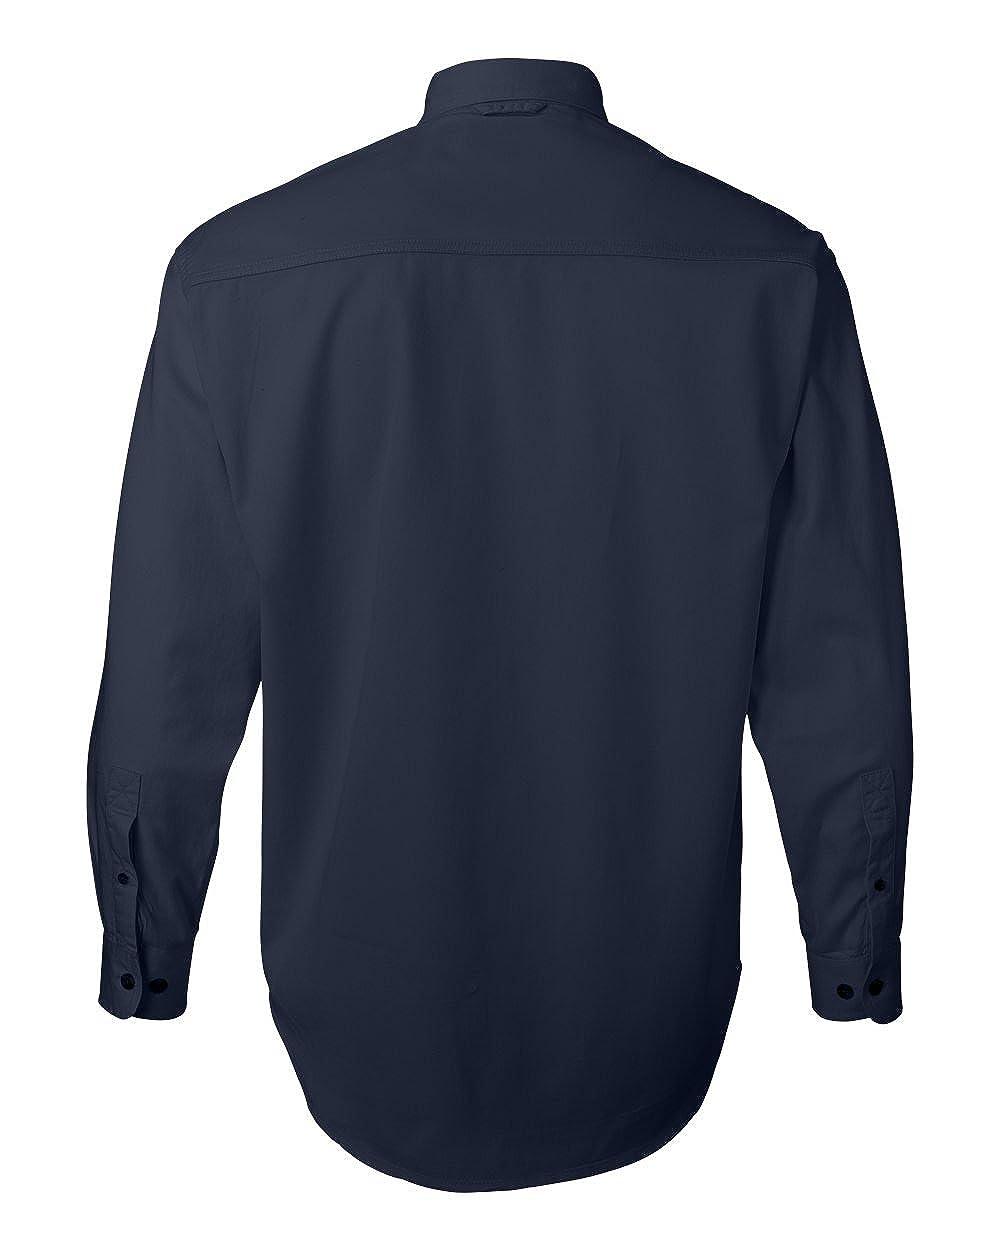 Long Sleeve Cotton Twill Shirt 3201 Sierra Pacific